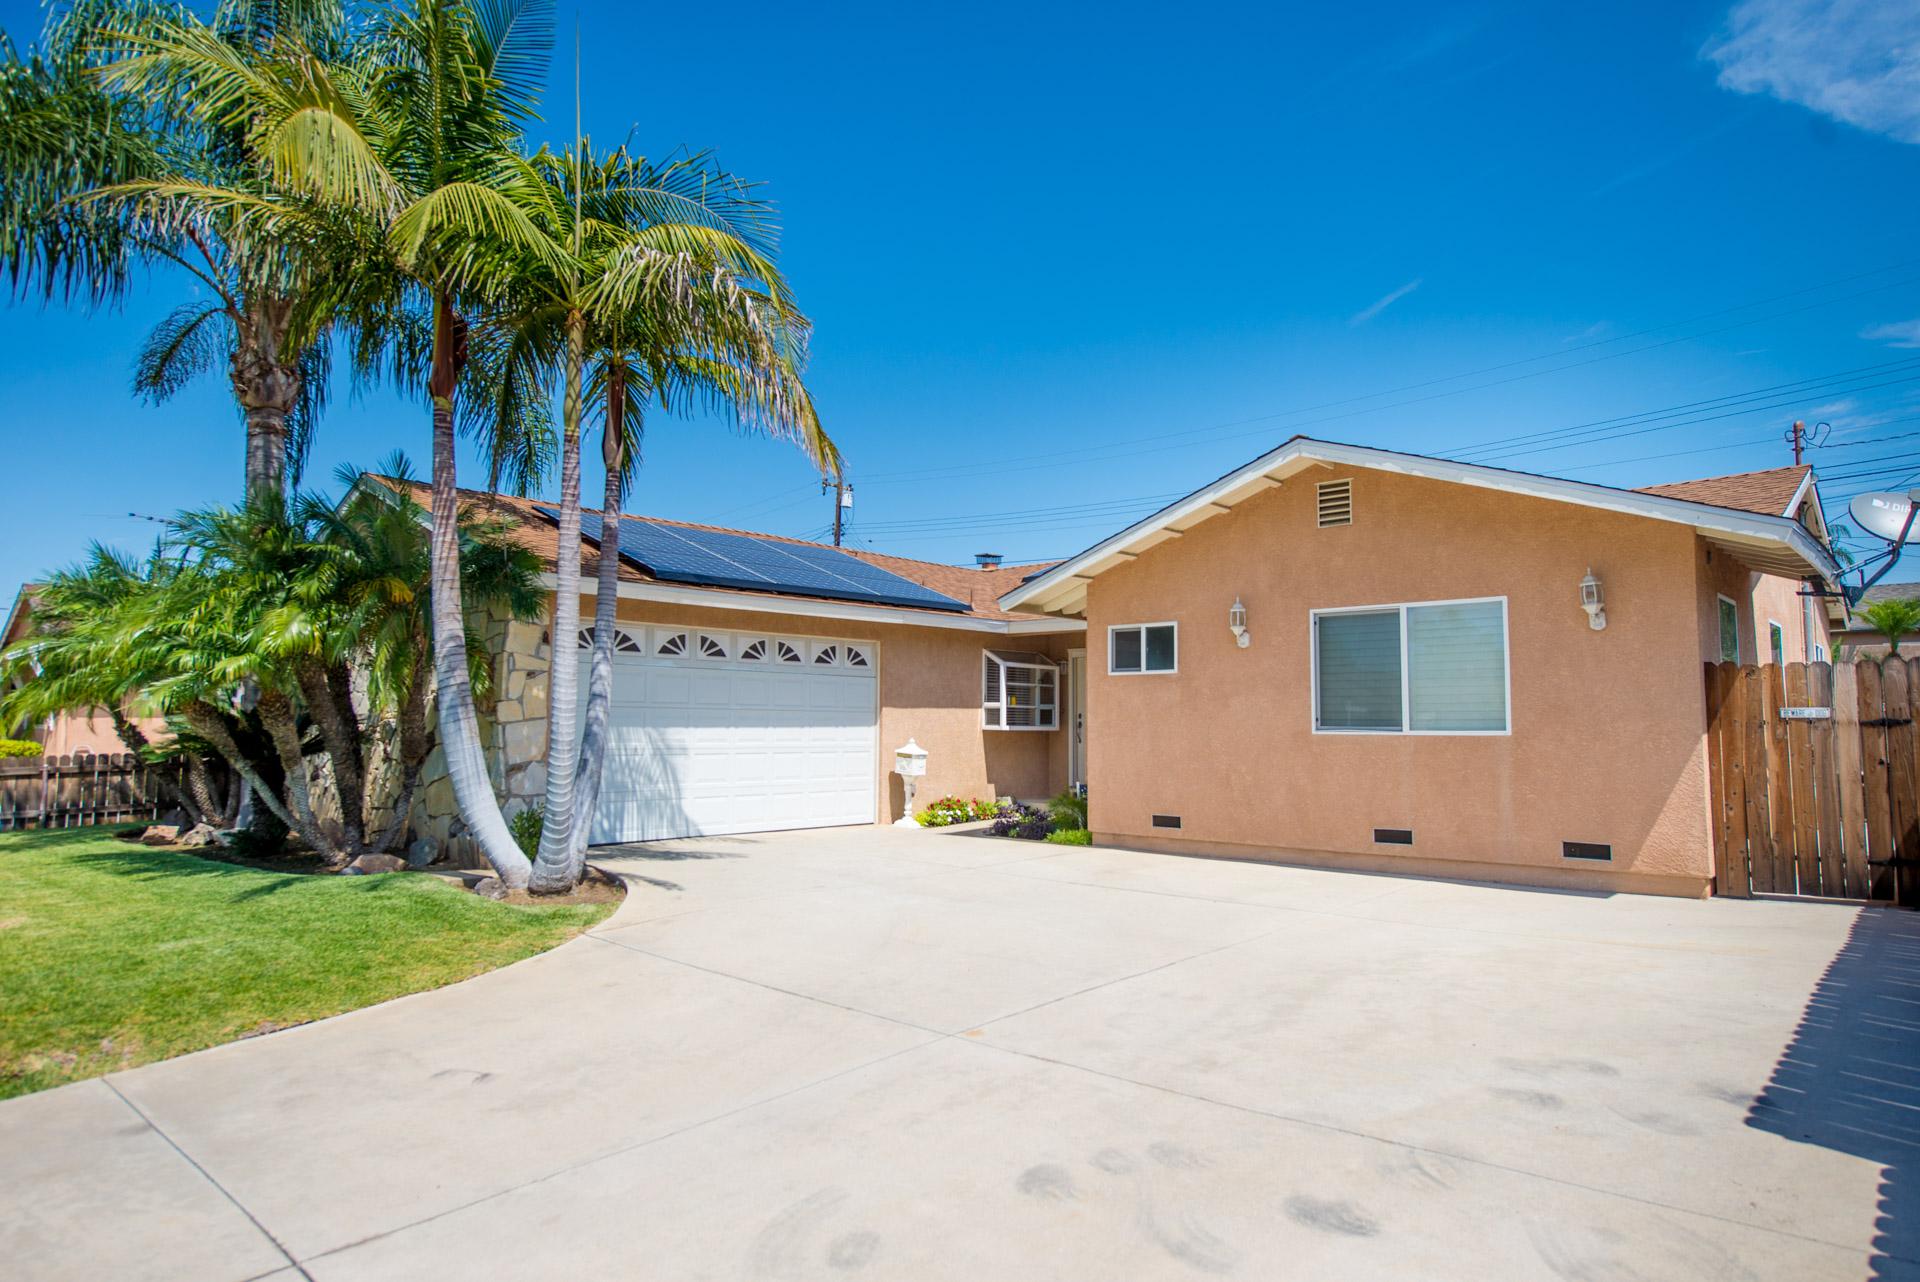 La Mirada Home Sold By Dustin Sweeter